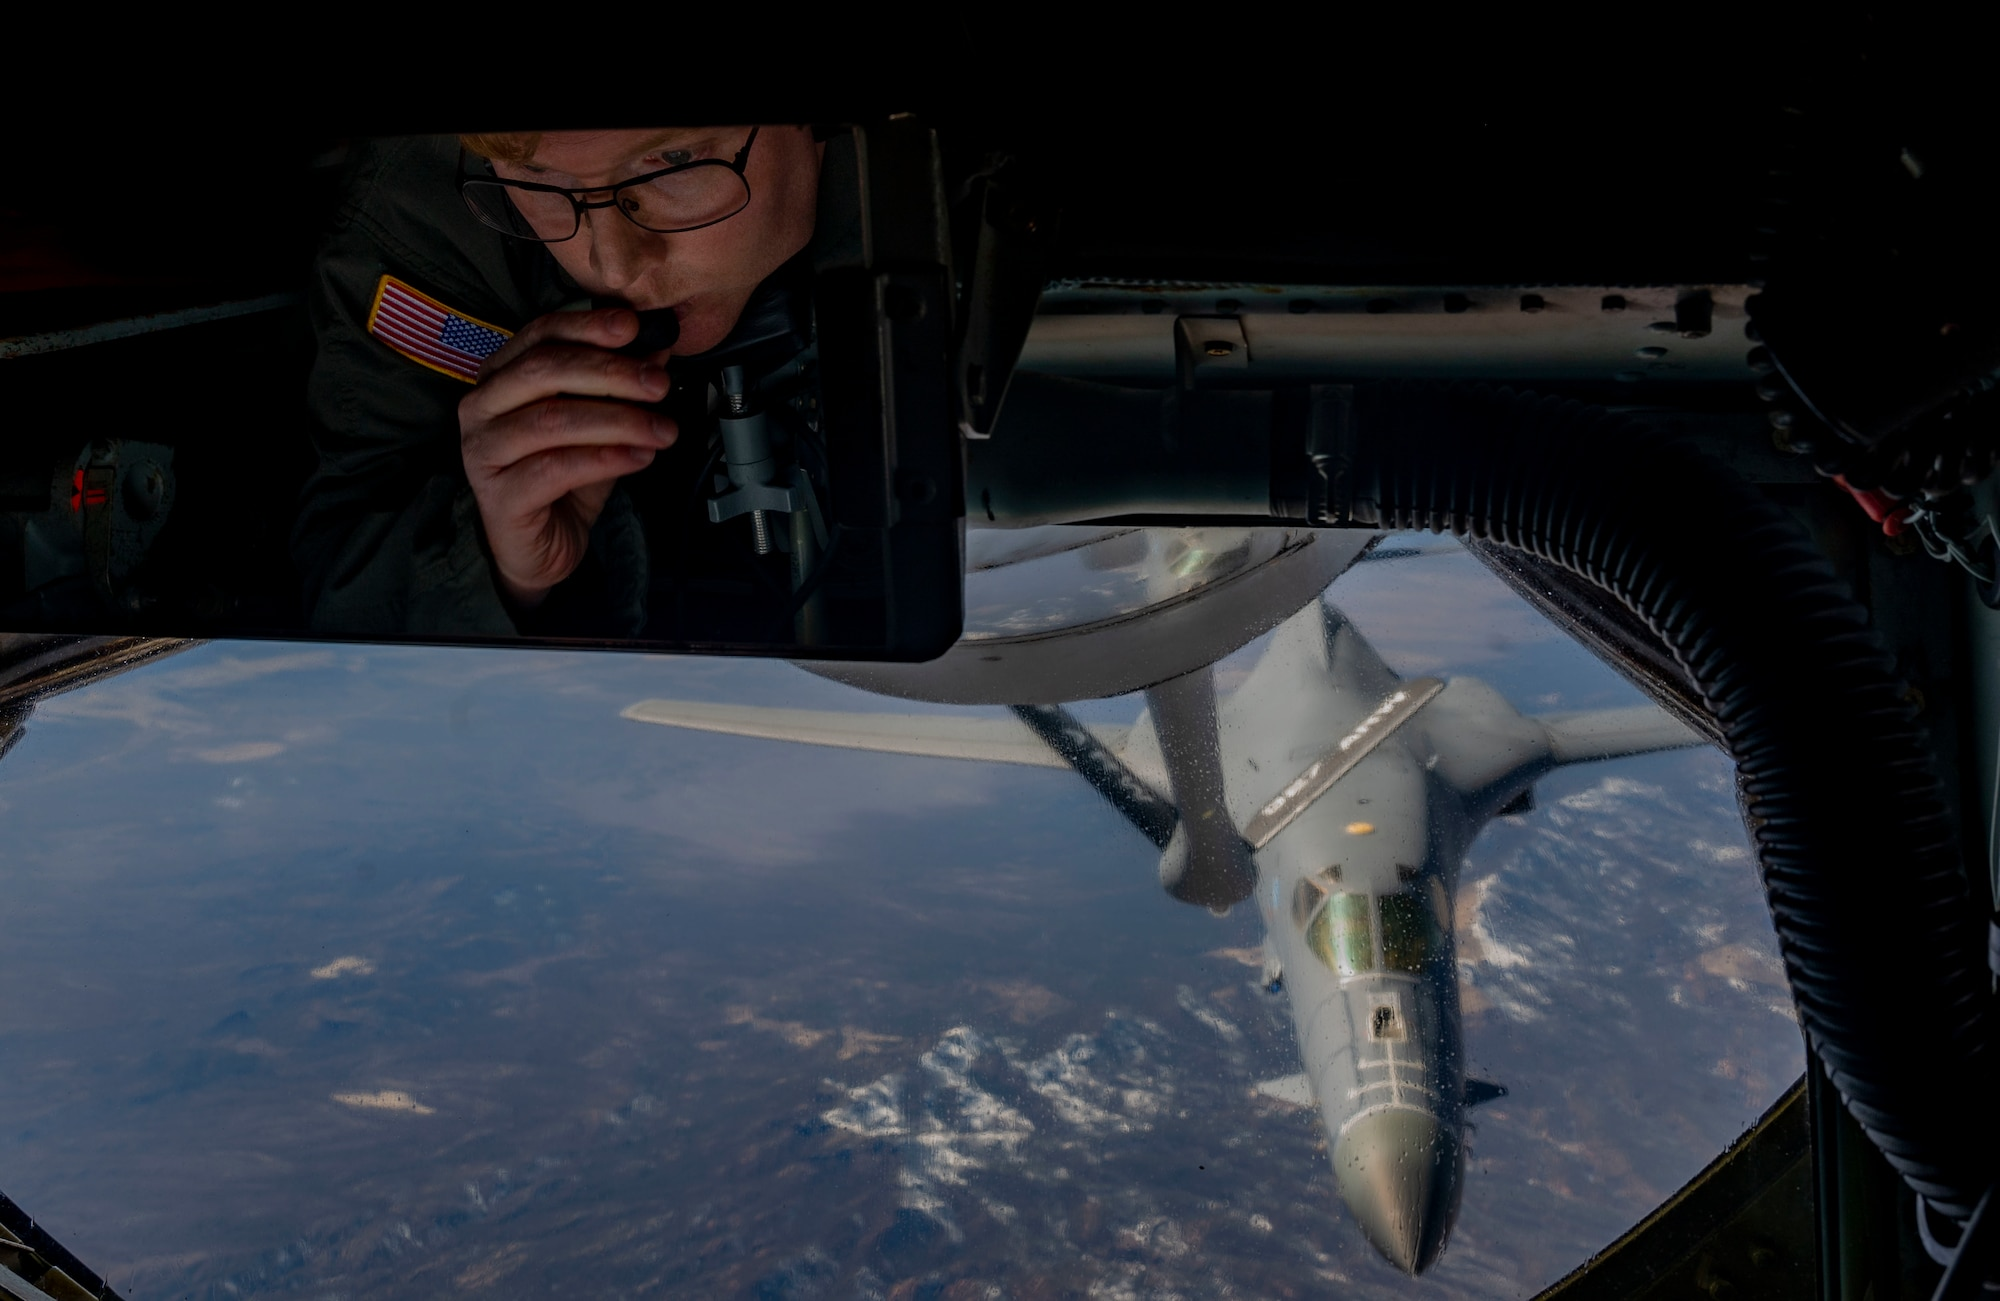 Plane refueling in Air